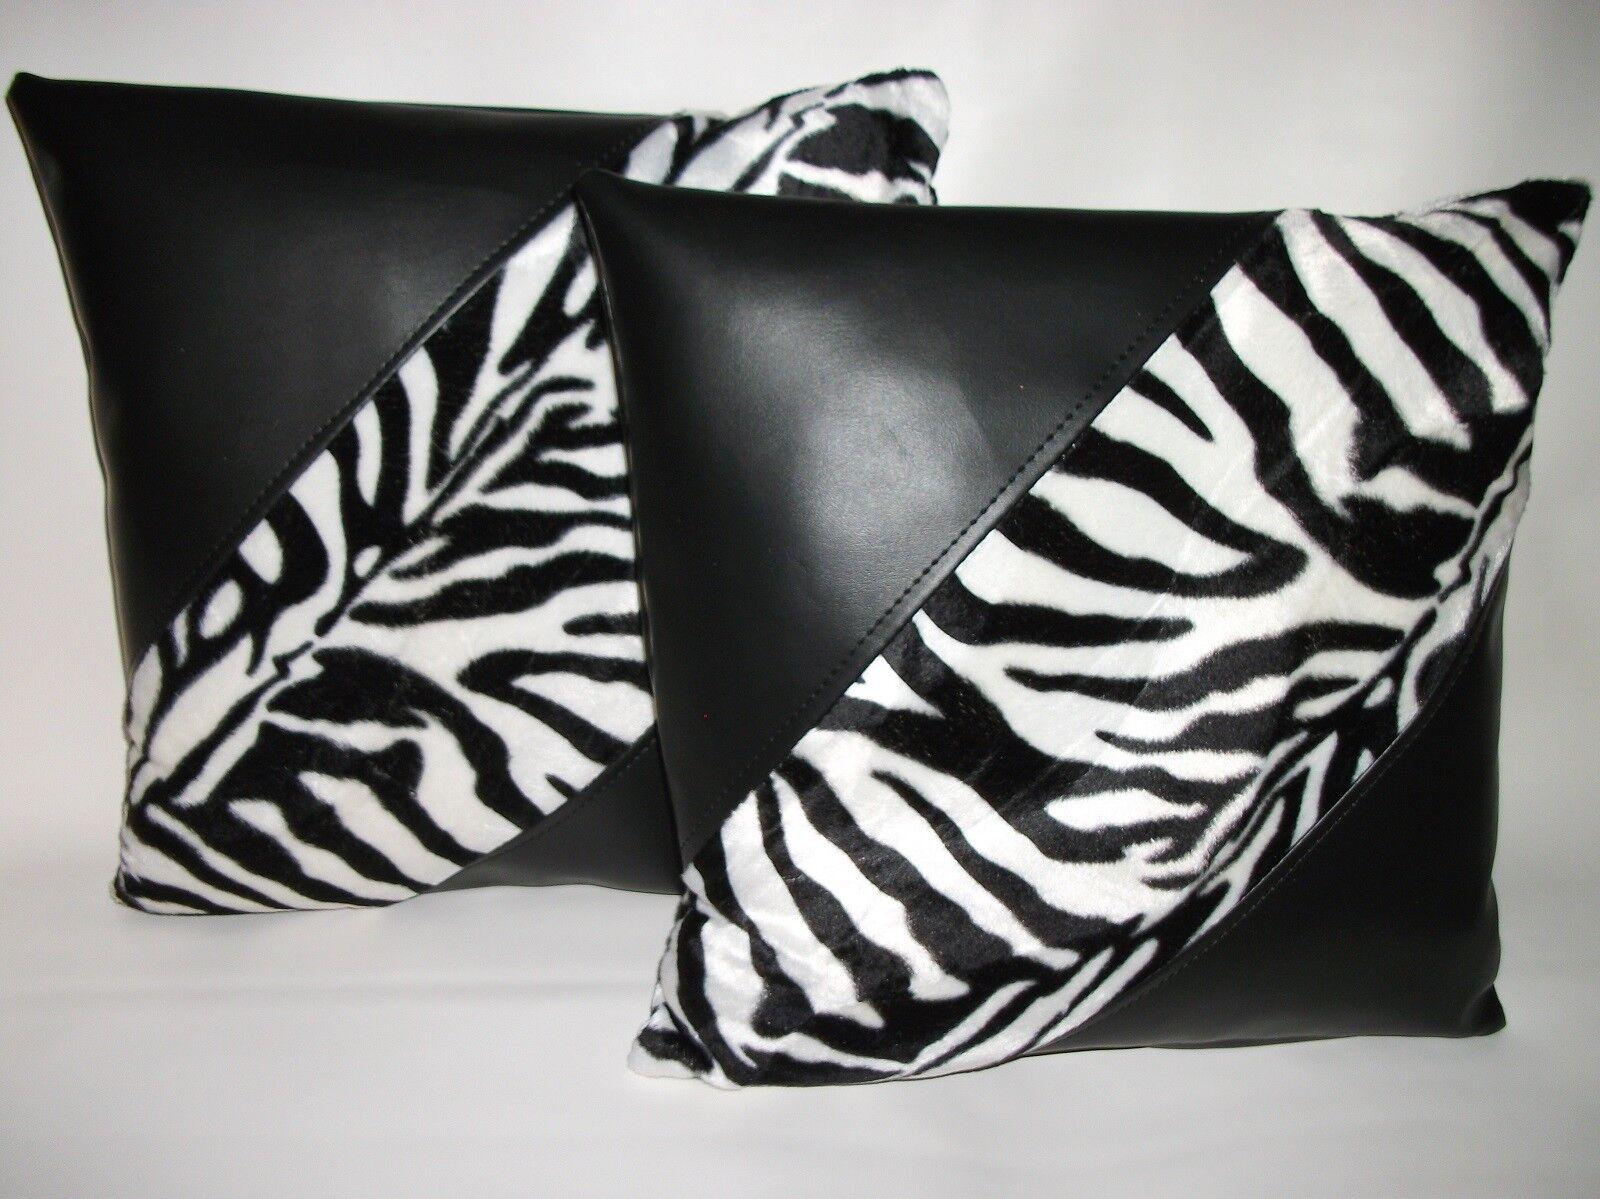 2 Black Black Black Faux Leather & Faux Fur Zebra Diagonal Cushions 16